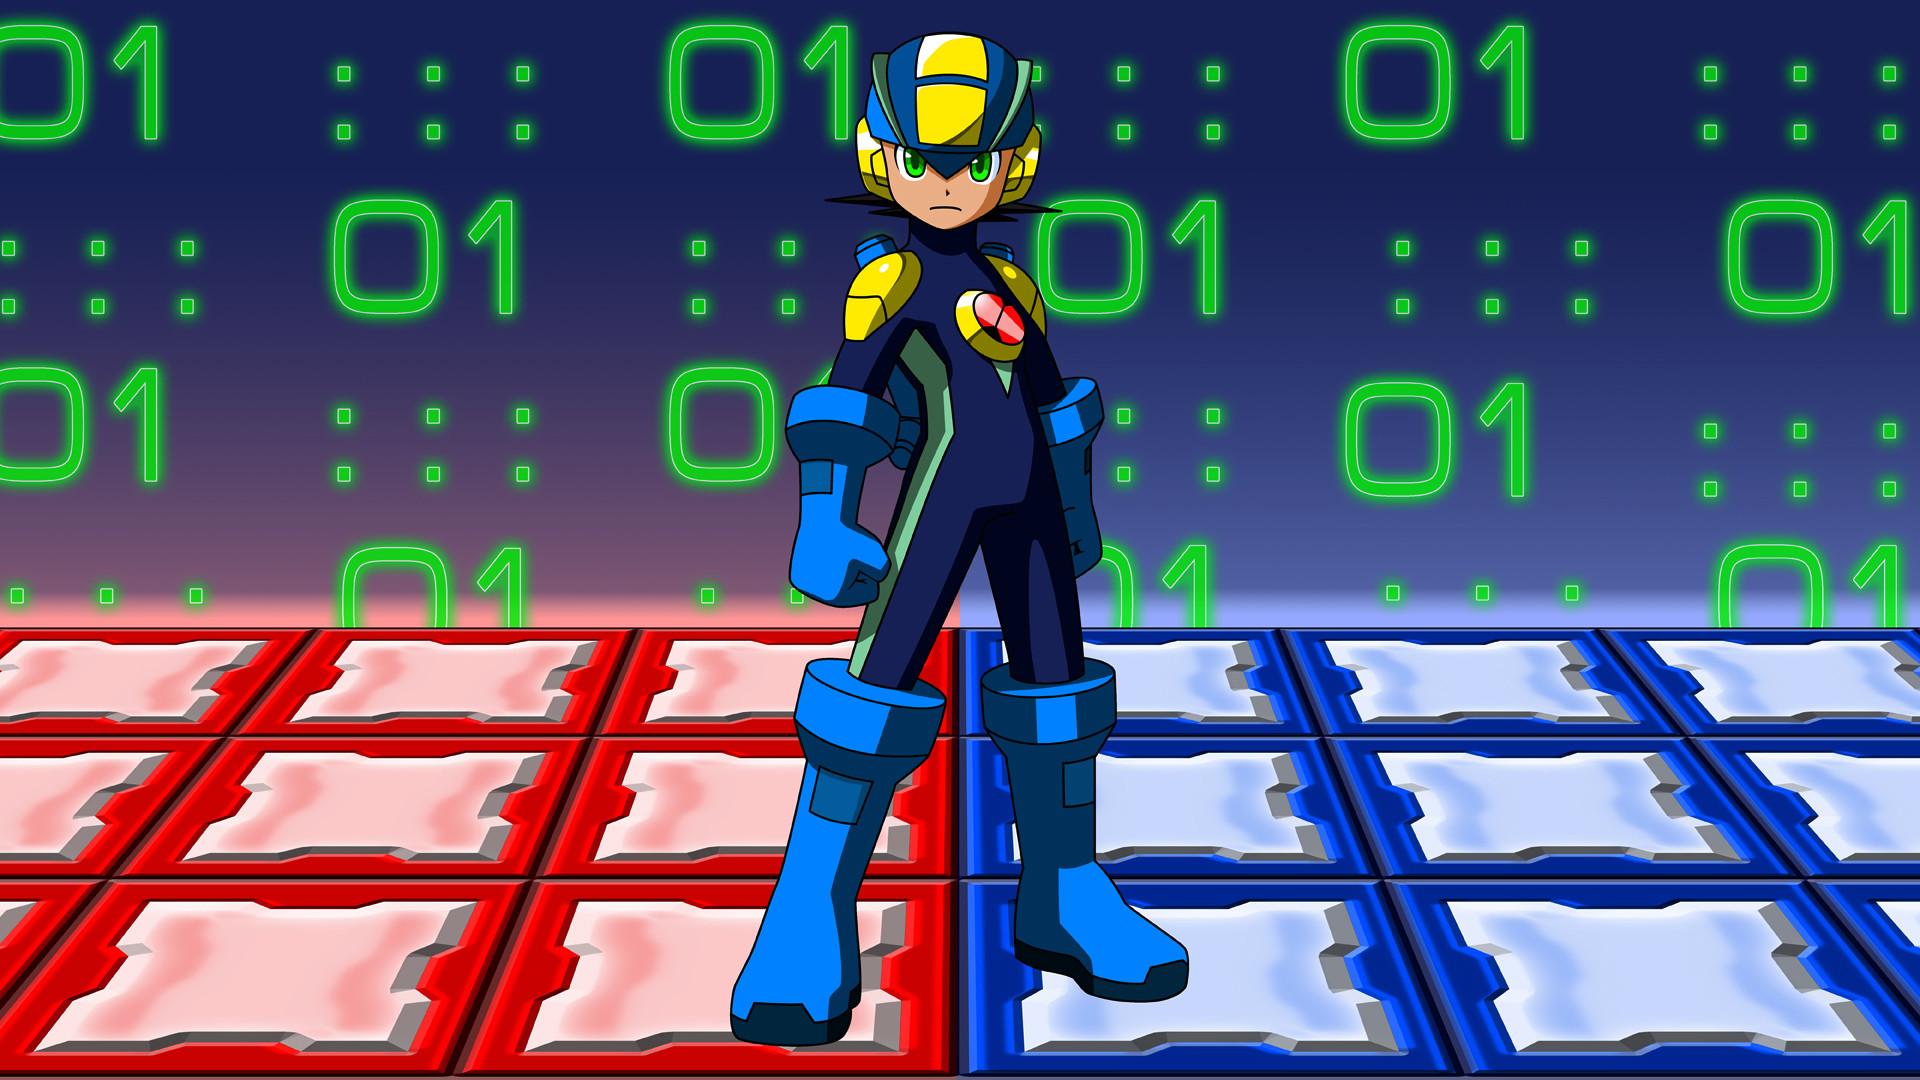 3 Mega Man Battle Network HD Wallpapers | Backgrounds – Wallpaper Abyss